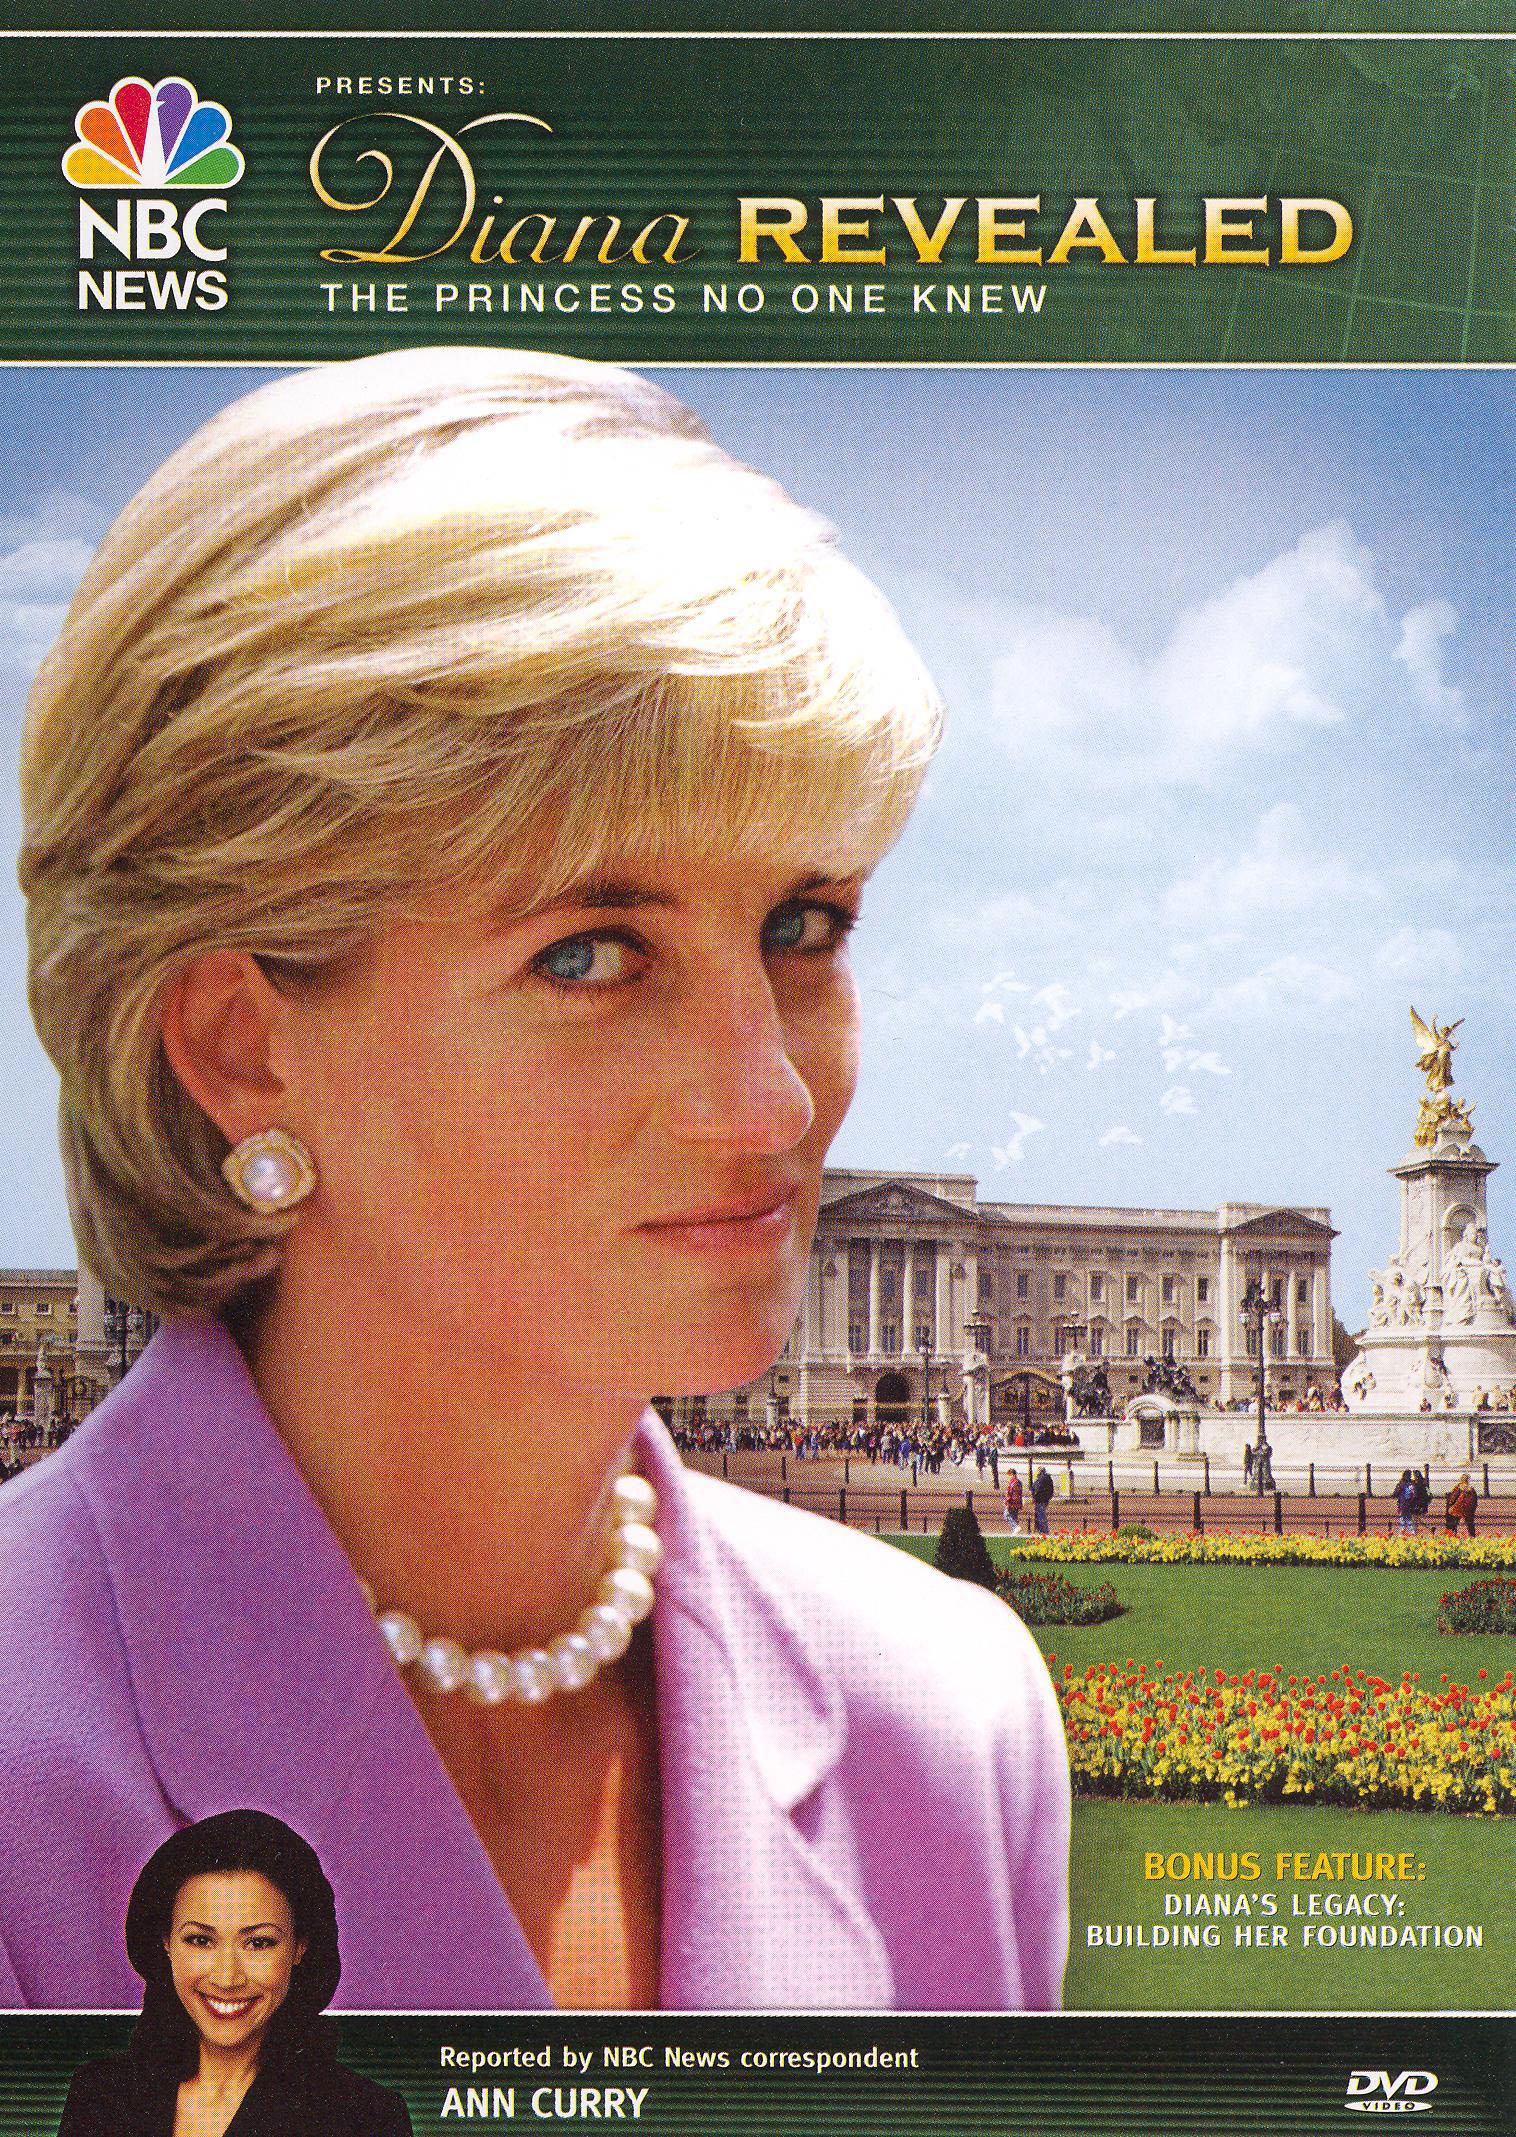 NBC News Presents Diana Revealed: The Princess No One Knew